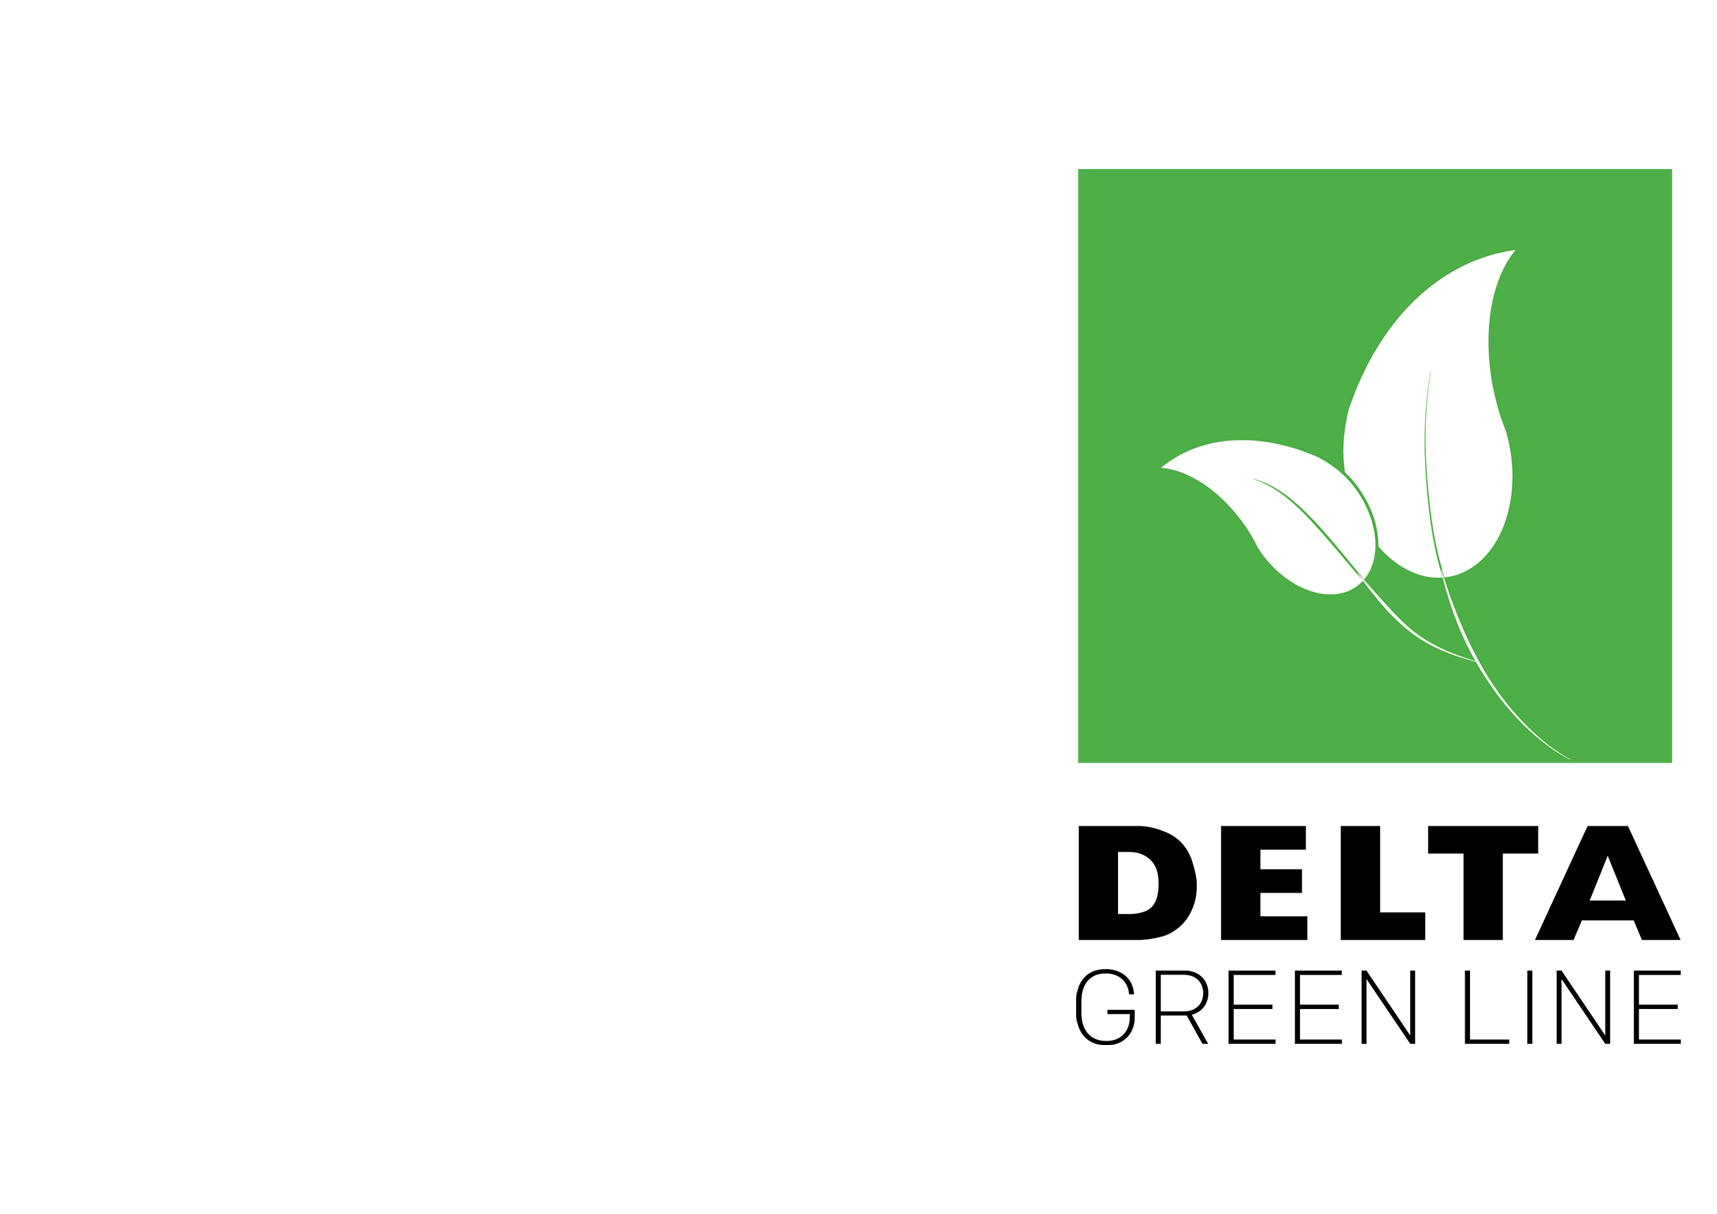 DELTA Green Line